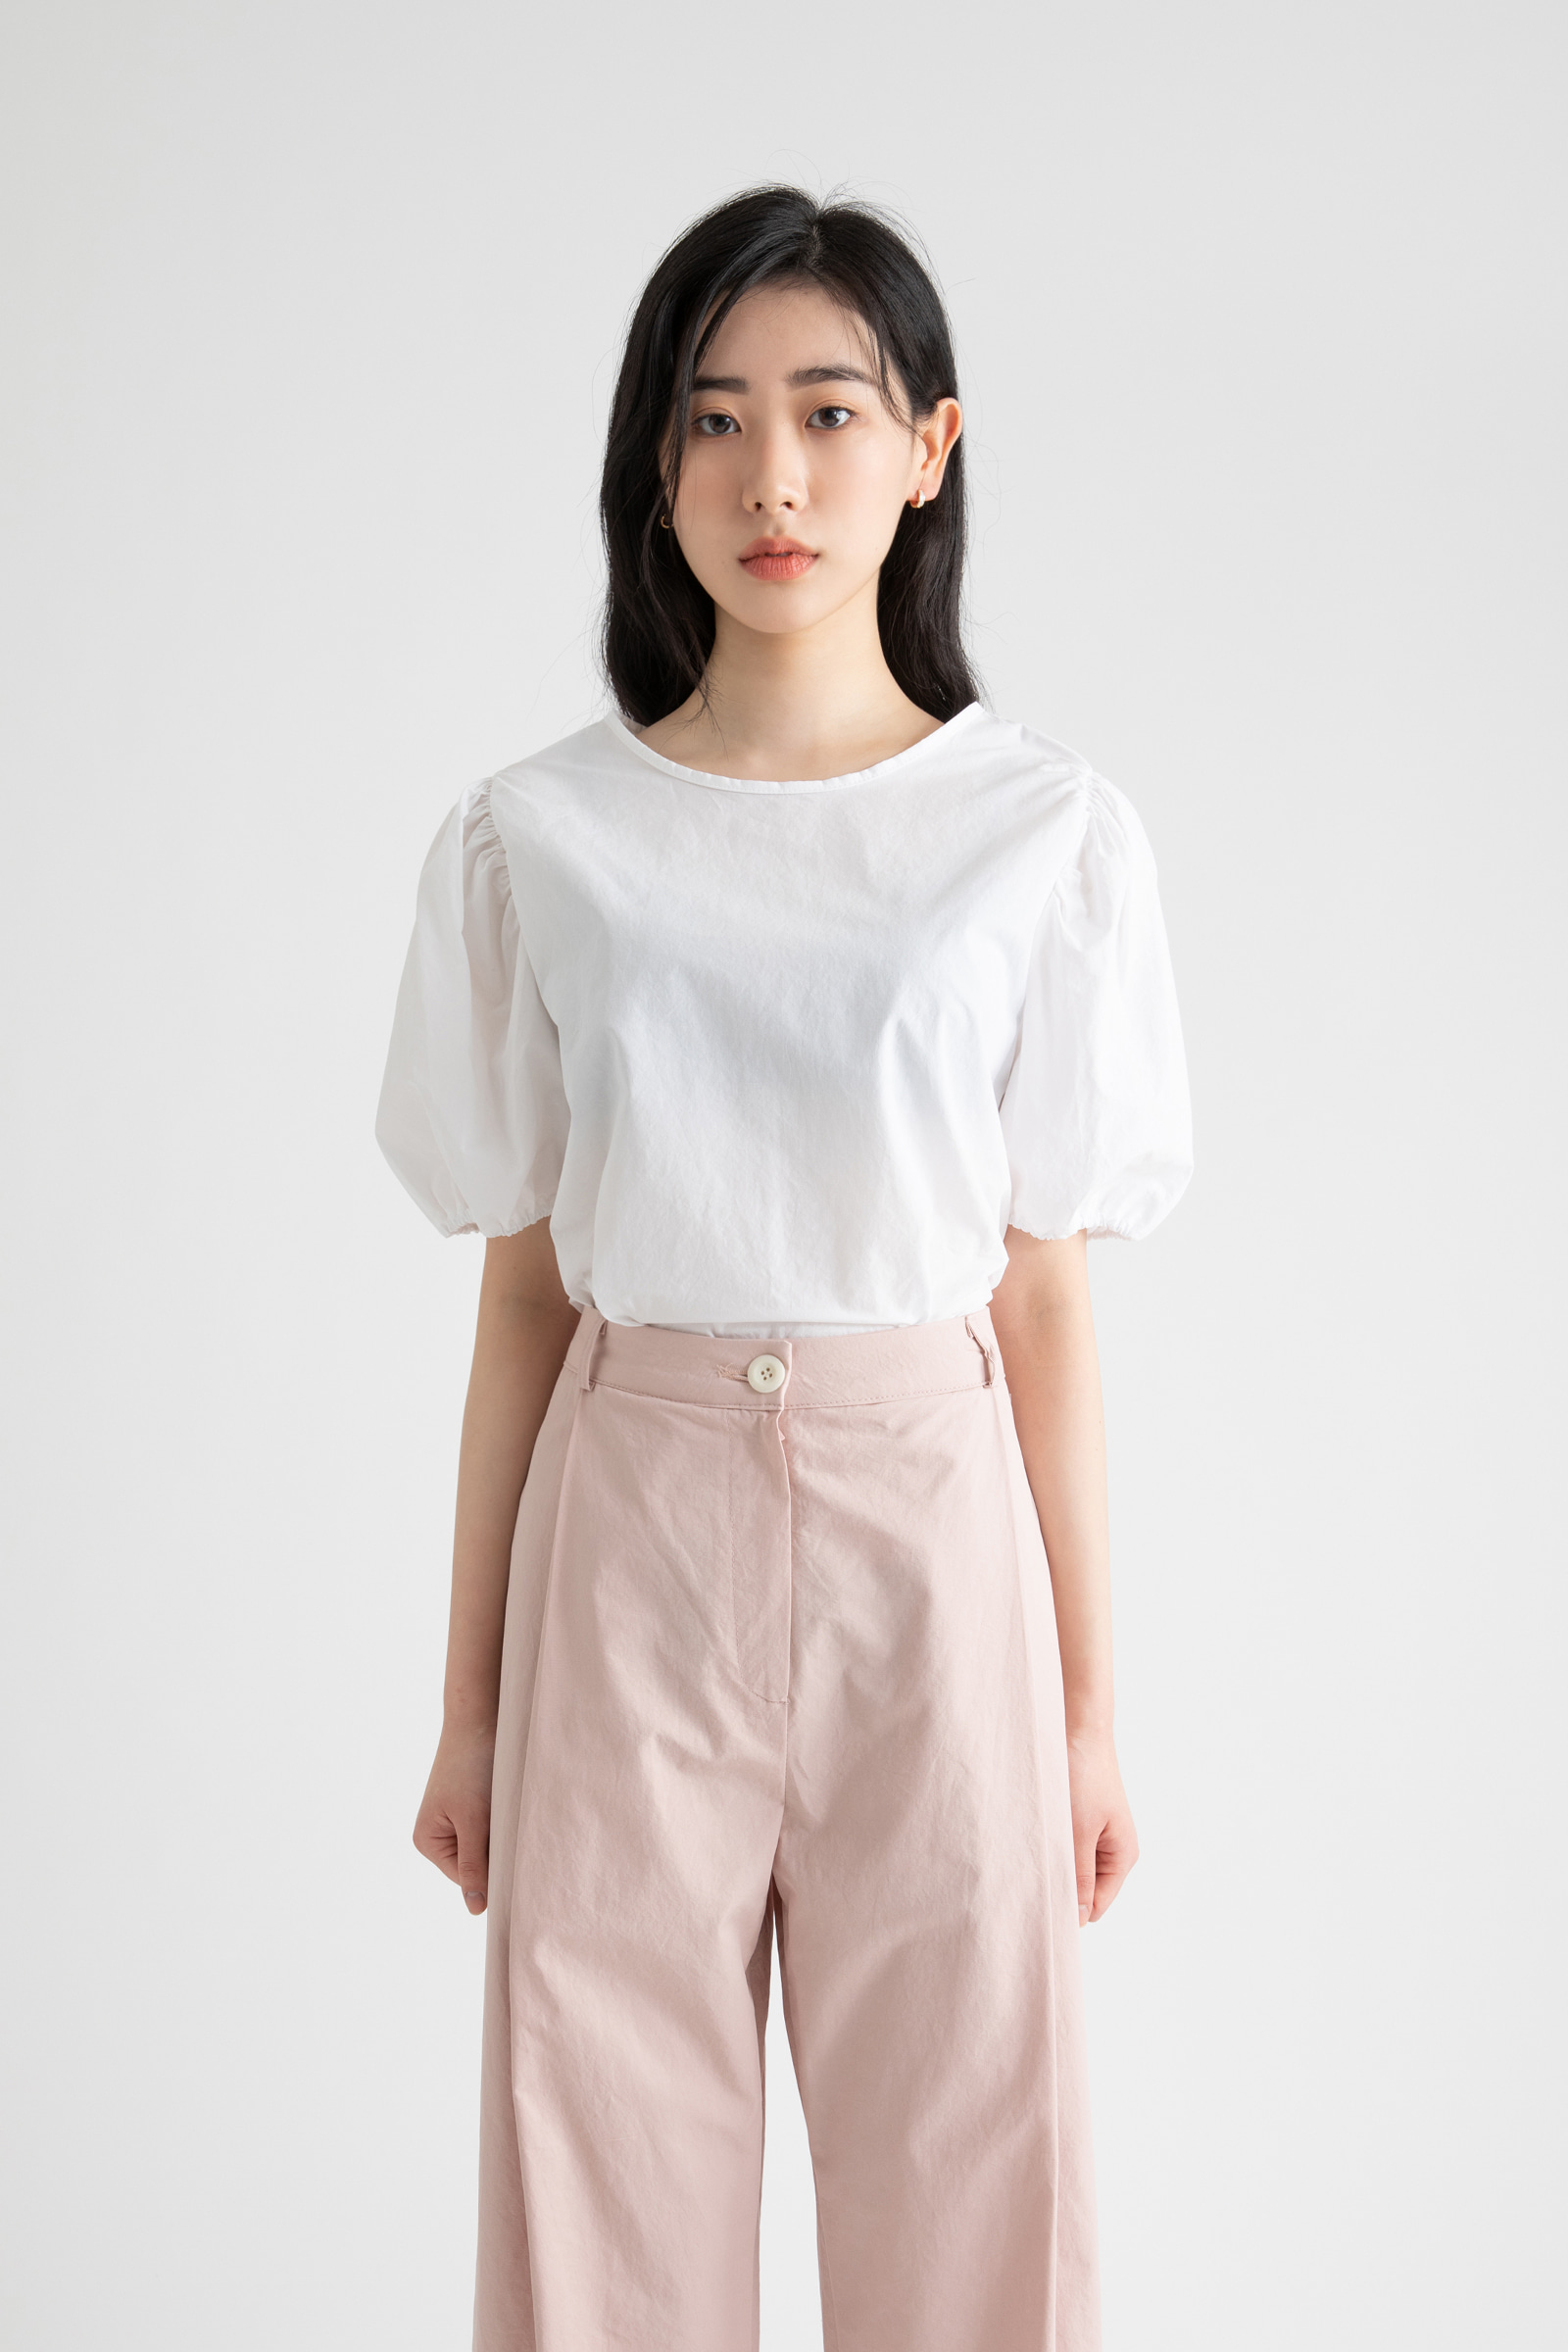 Pumpkin puff ribbon blouse